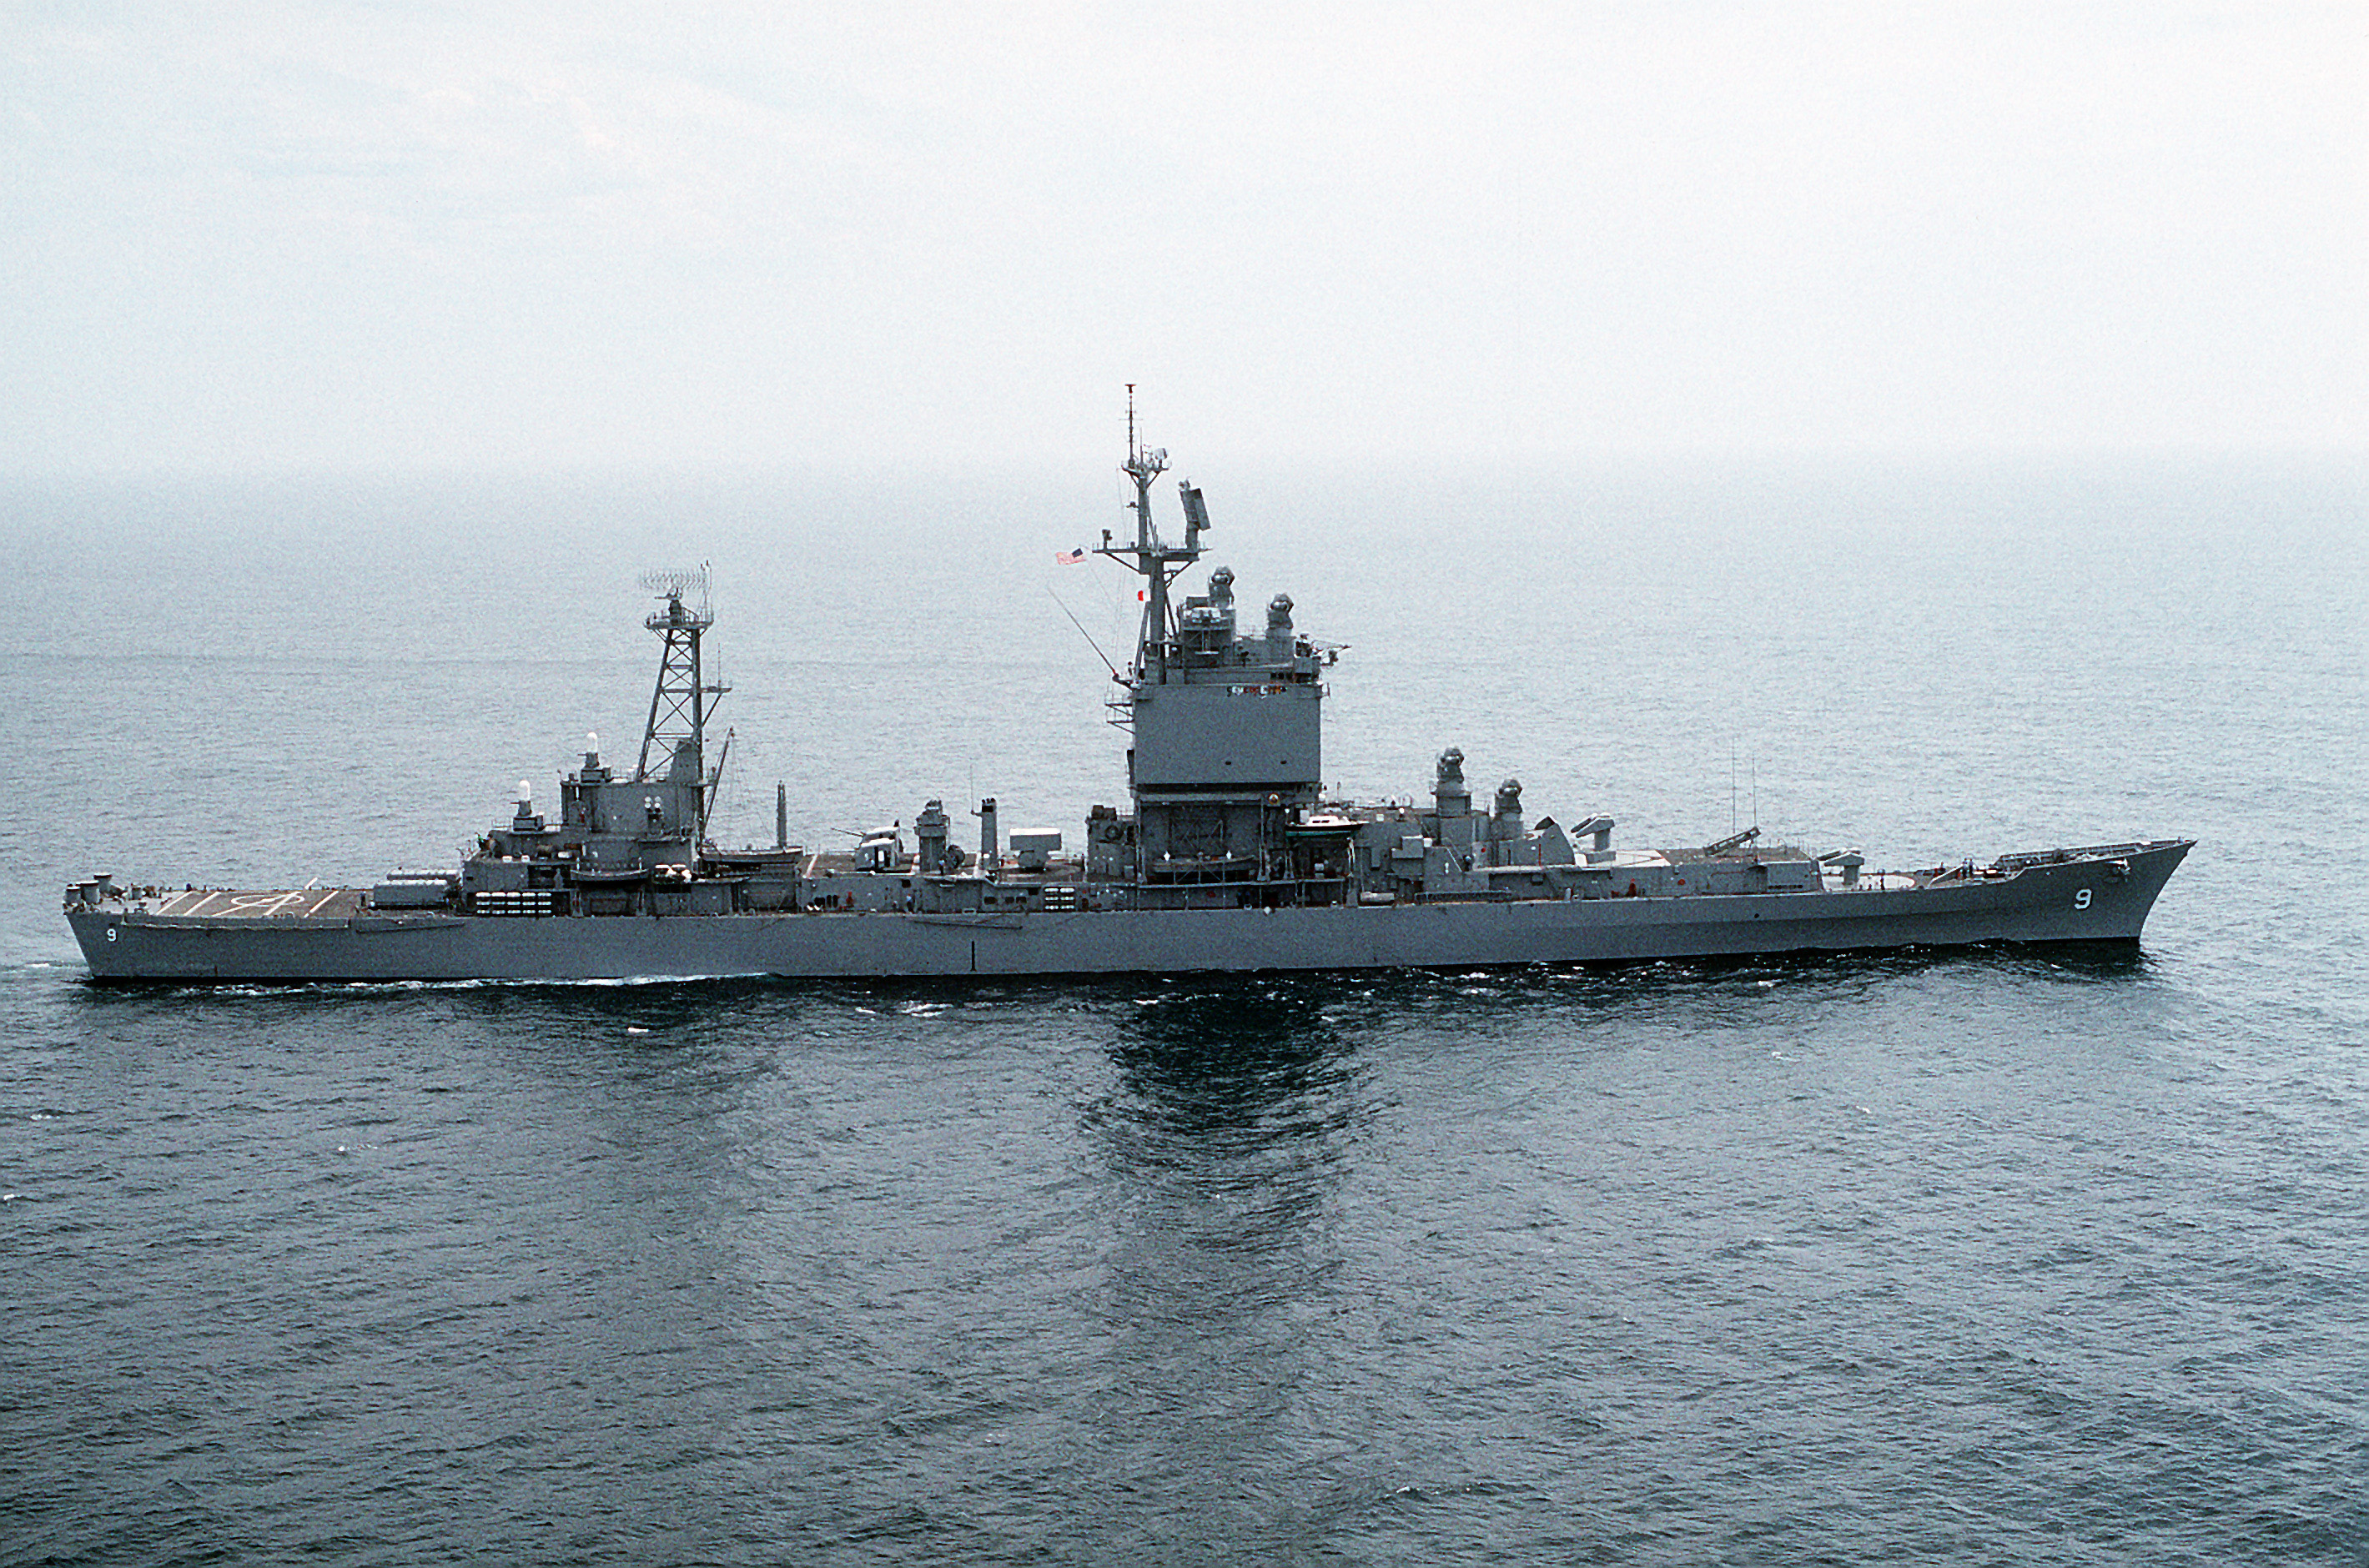 USS_Long_Beach_(CGN-9)_stbd_beam_view.jp